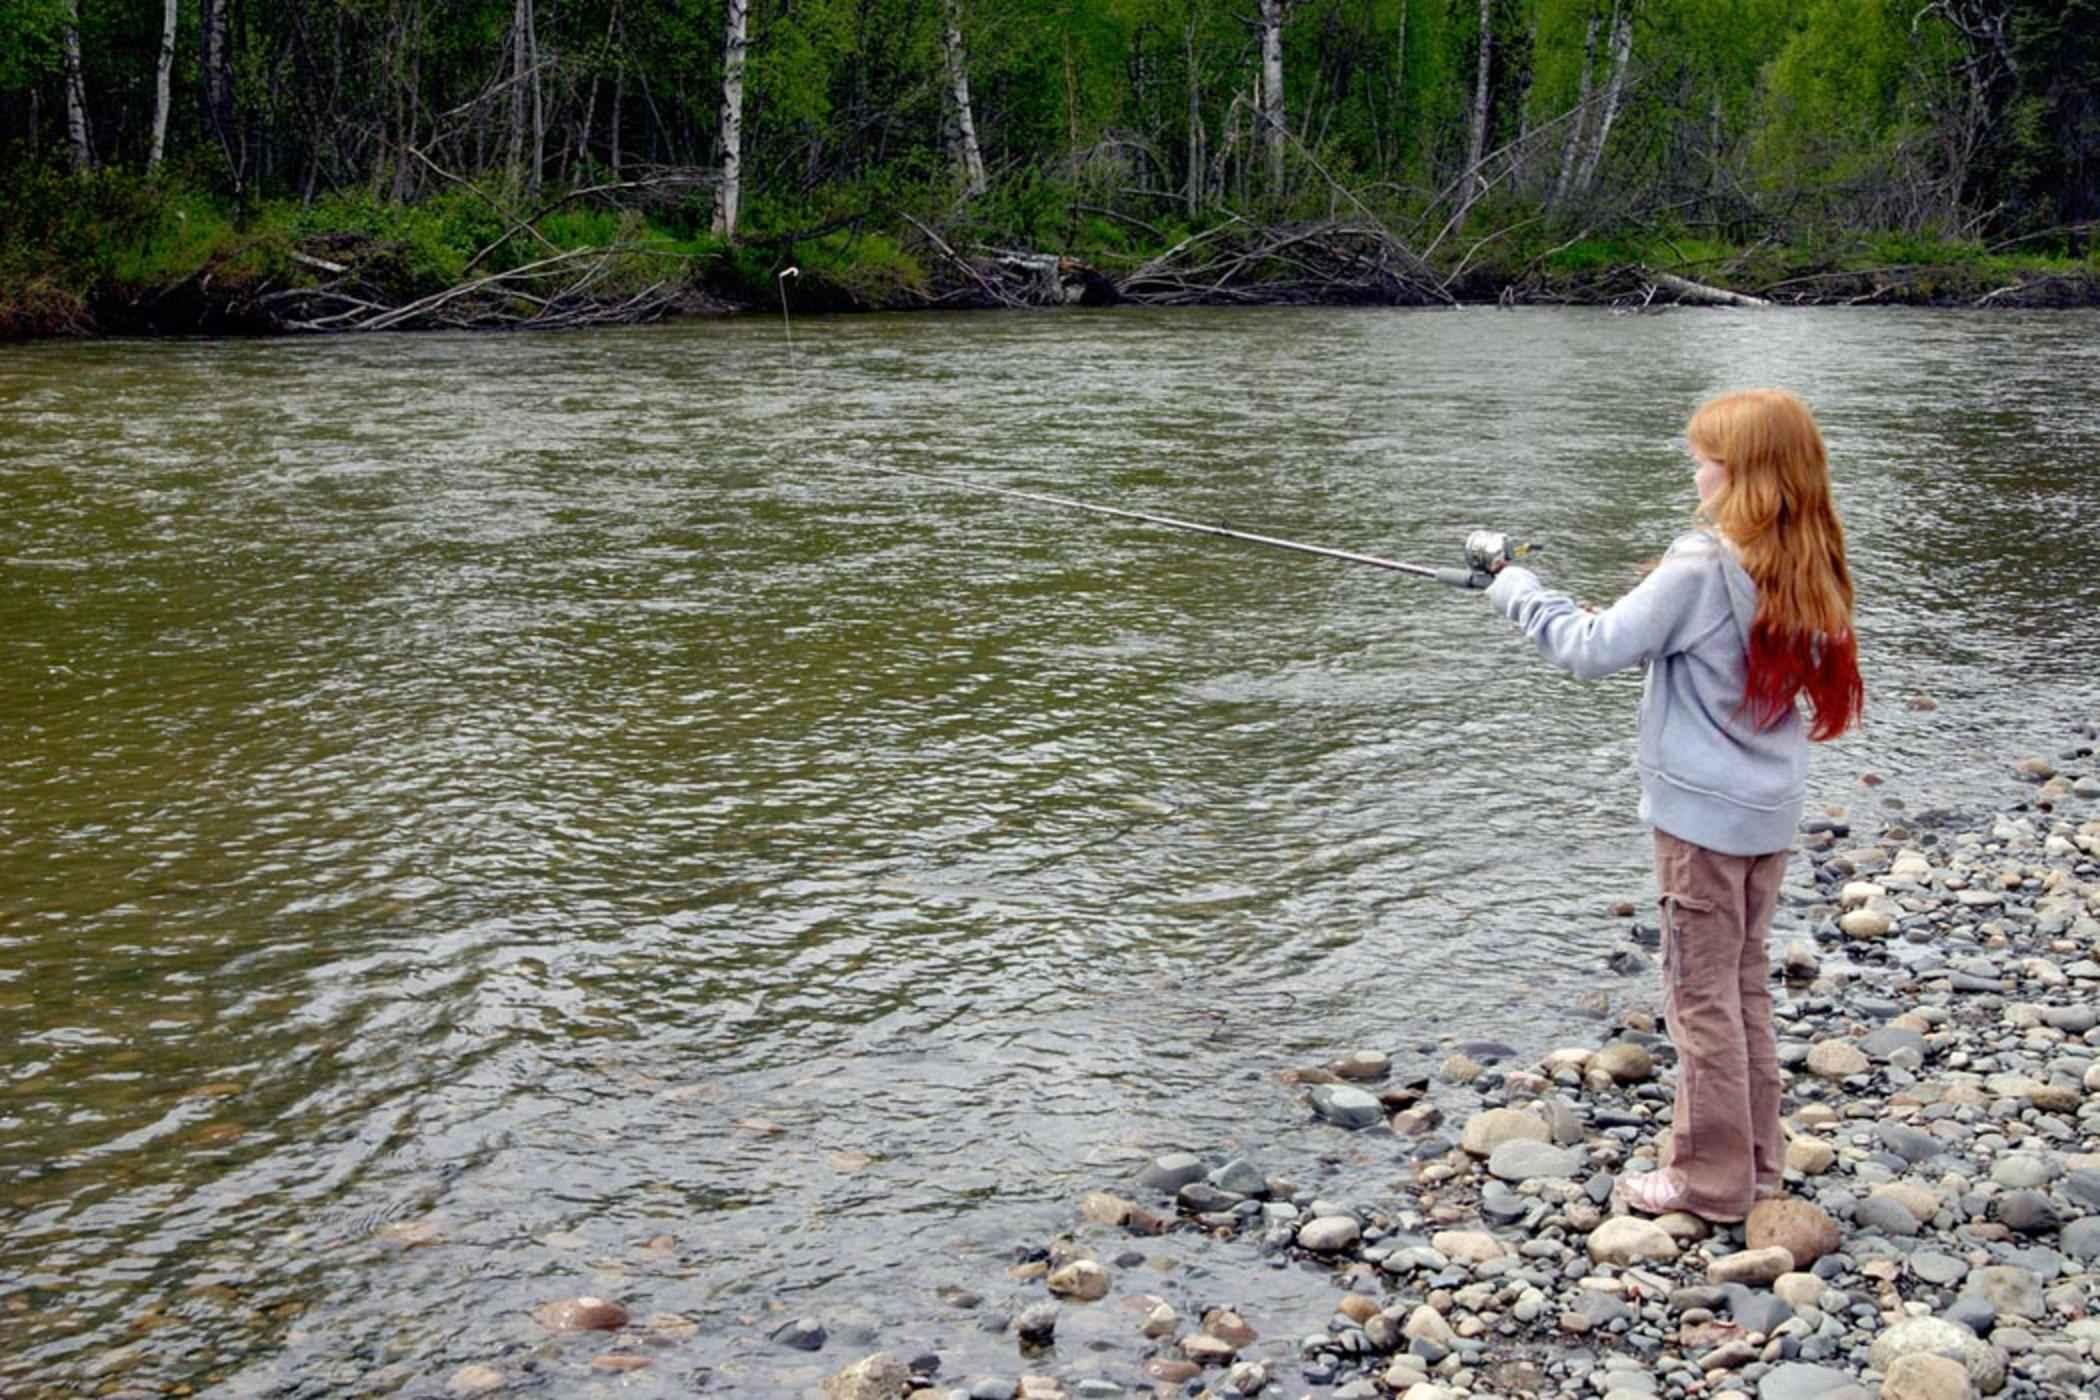 More girls go fishing in south australia seabreeze for Girls gone fishing